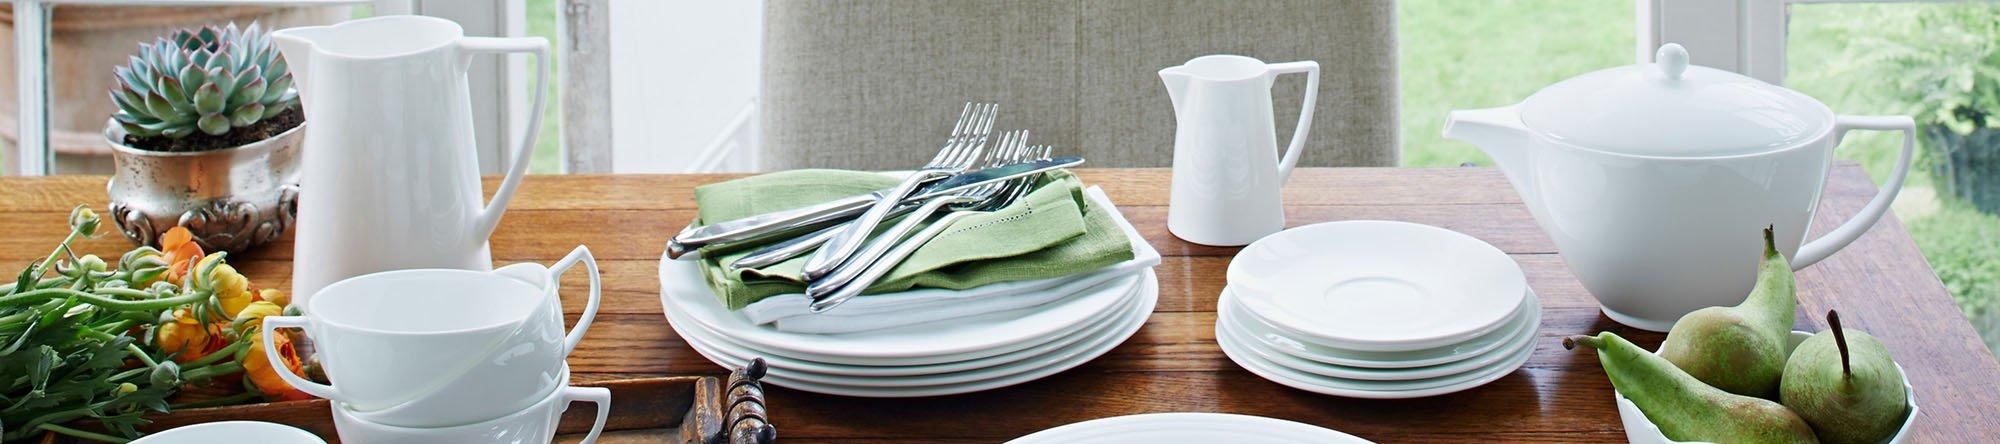 Jasper Conran White & Jasper Conran White Tableware - Place Sets Bowls Plates u0026 Mugs ...